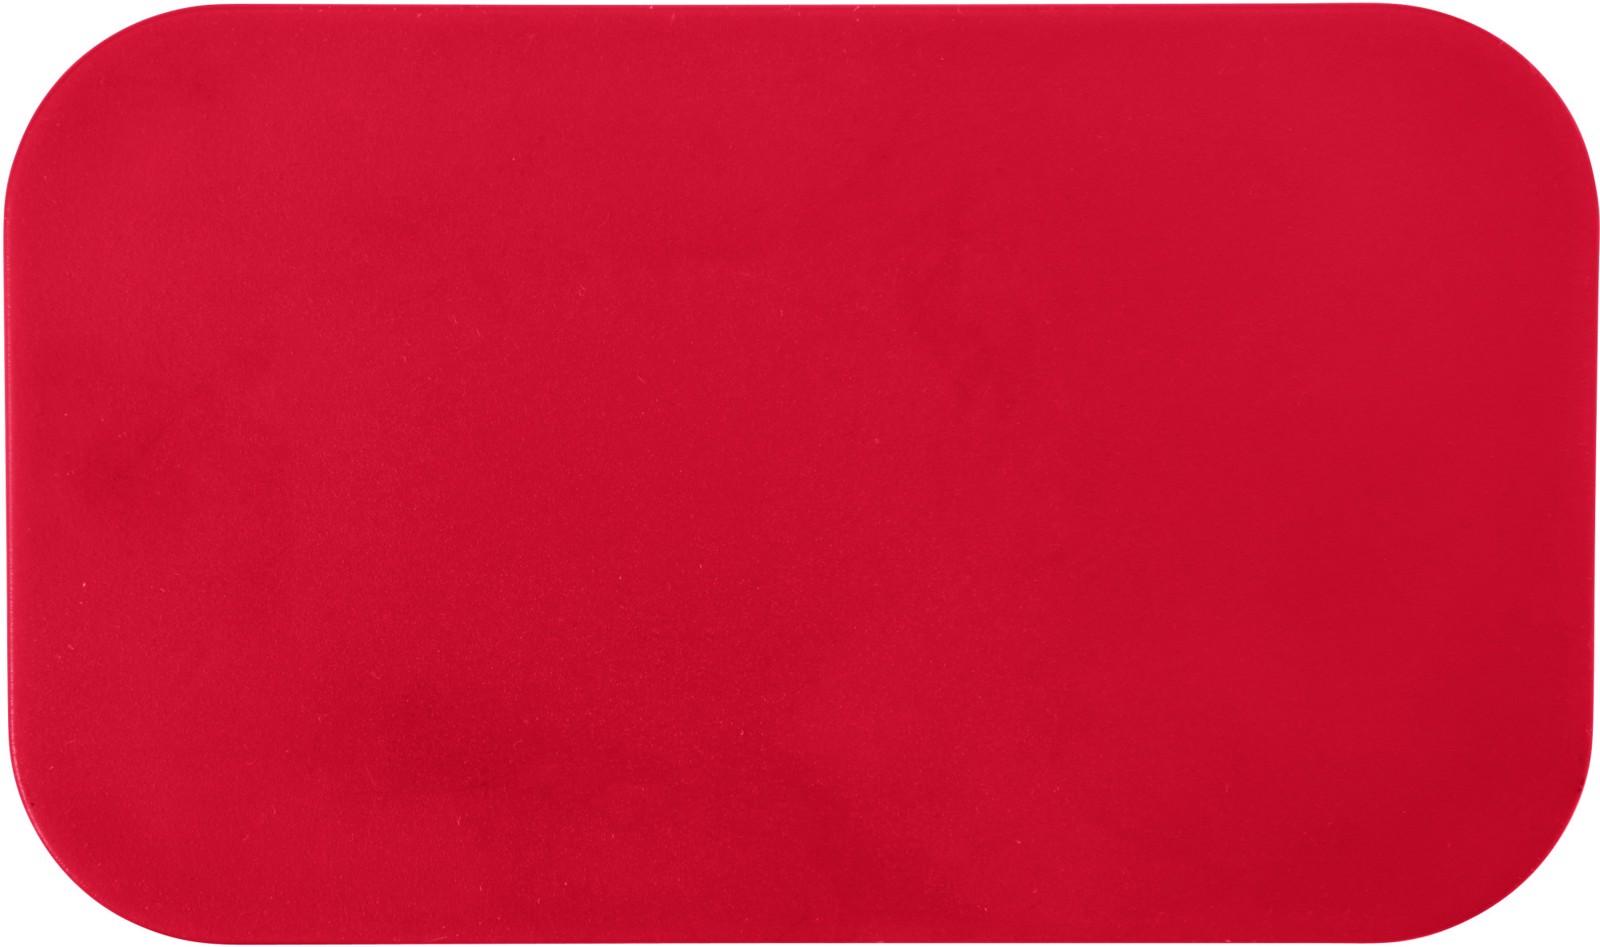 ABS speaker - Red